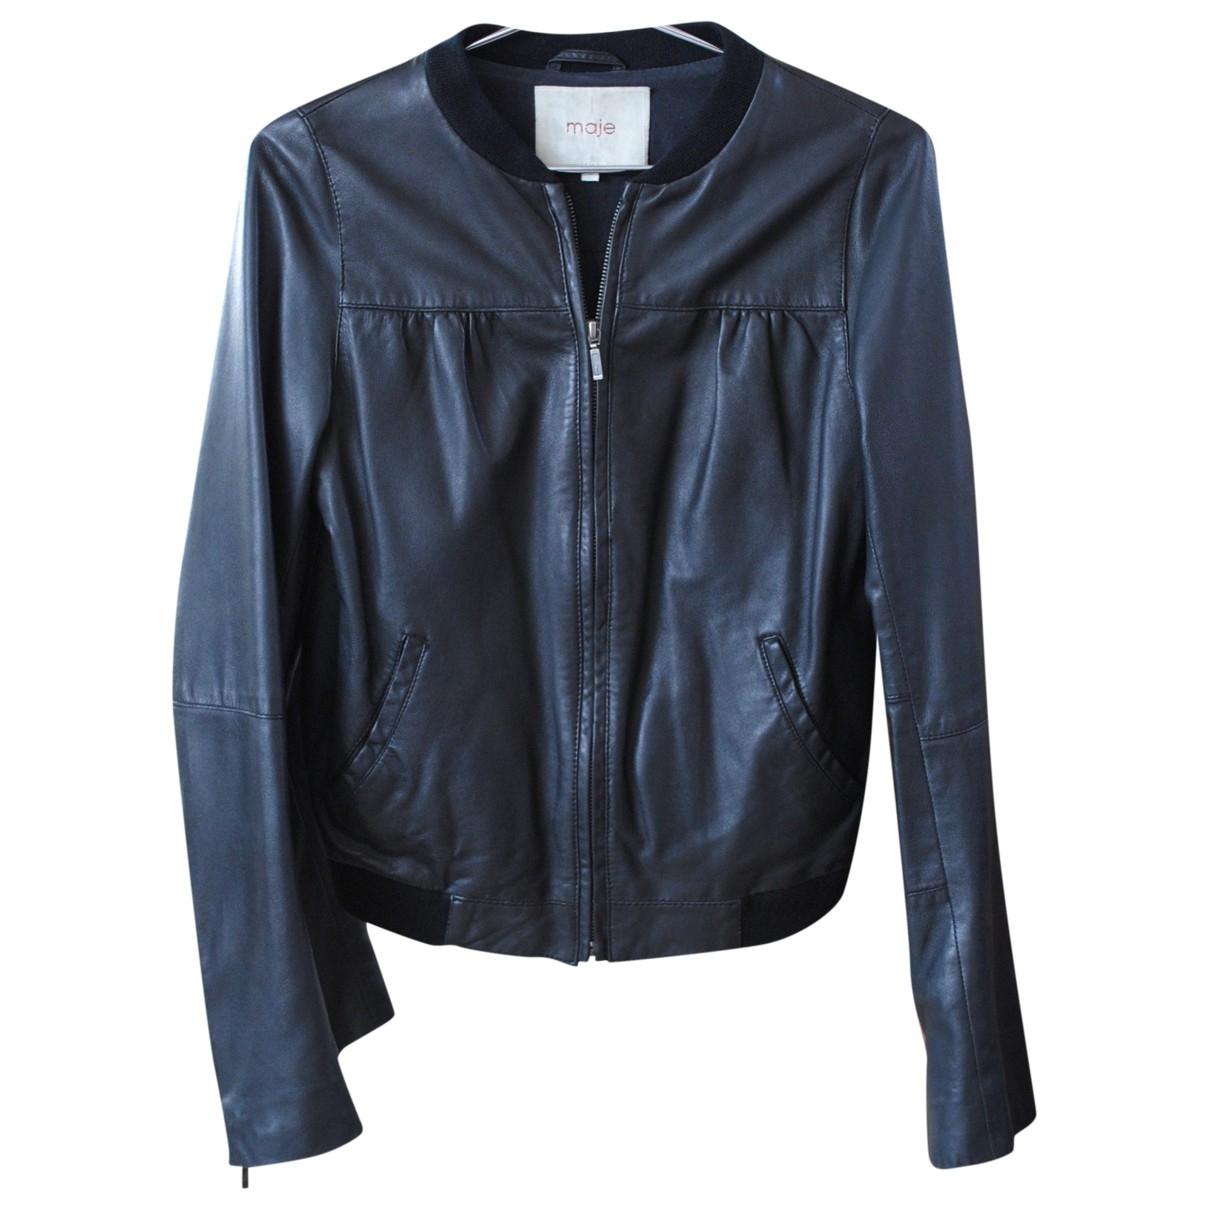 Maje \N Black Leather jacket for Women S International